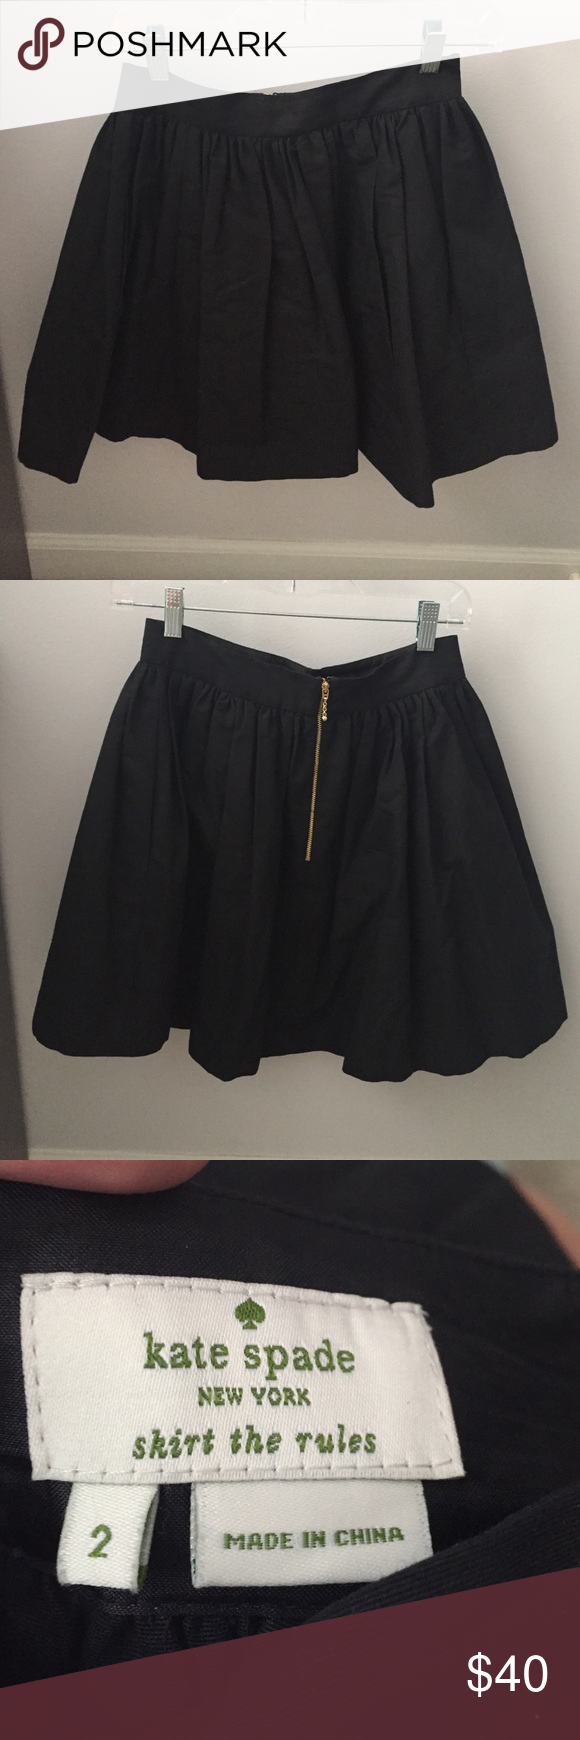 Black Kate spade skirt Super cute Kate spade skater skirt!! *it runs small* kate spade Skirts Circle & Skater